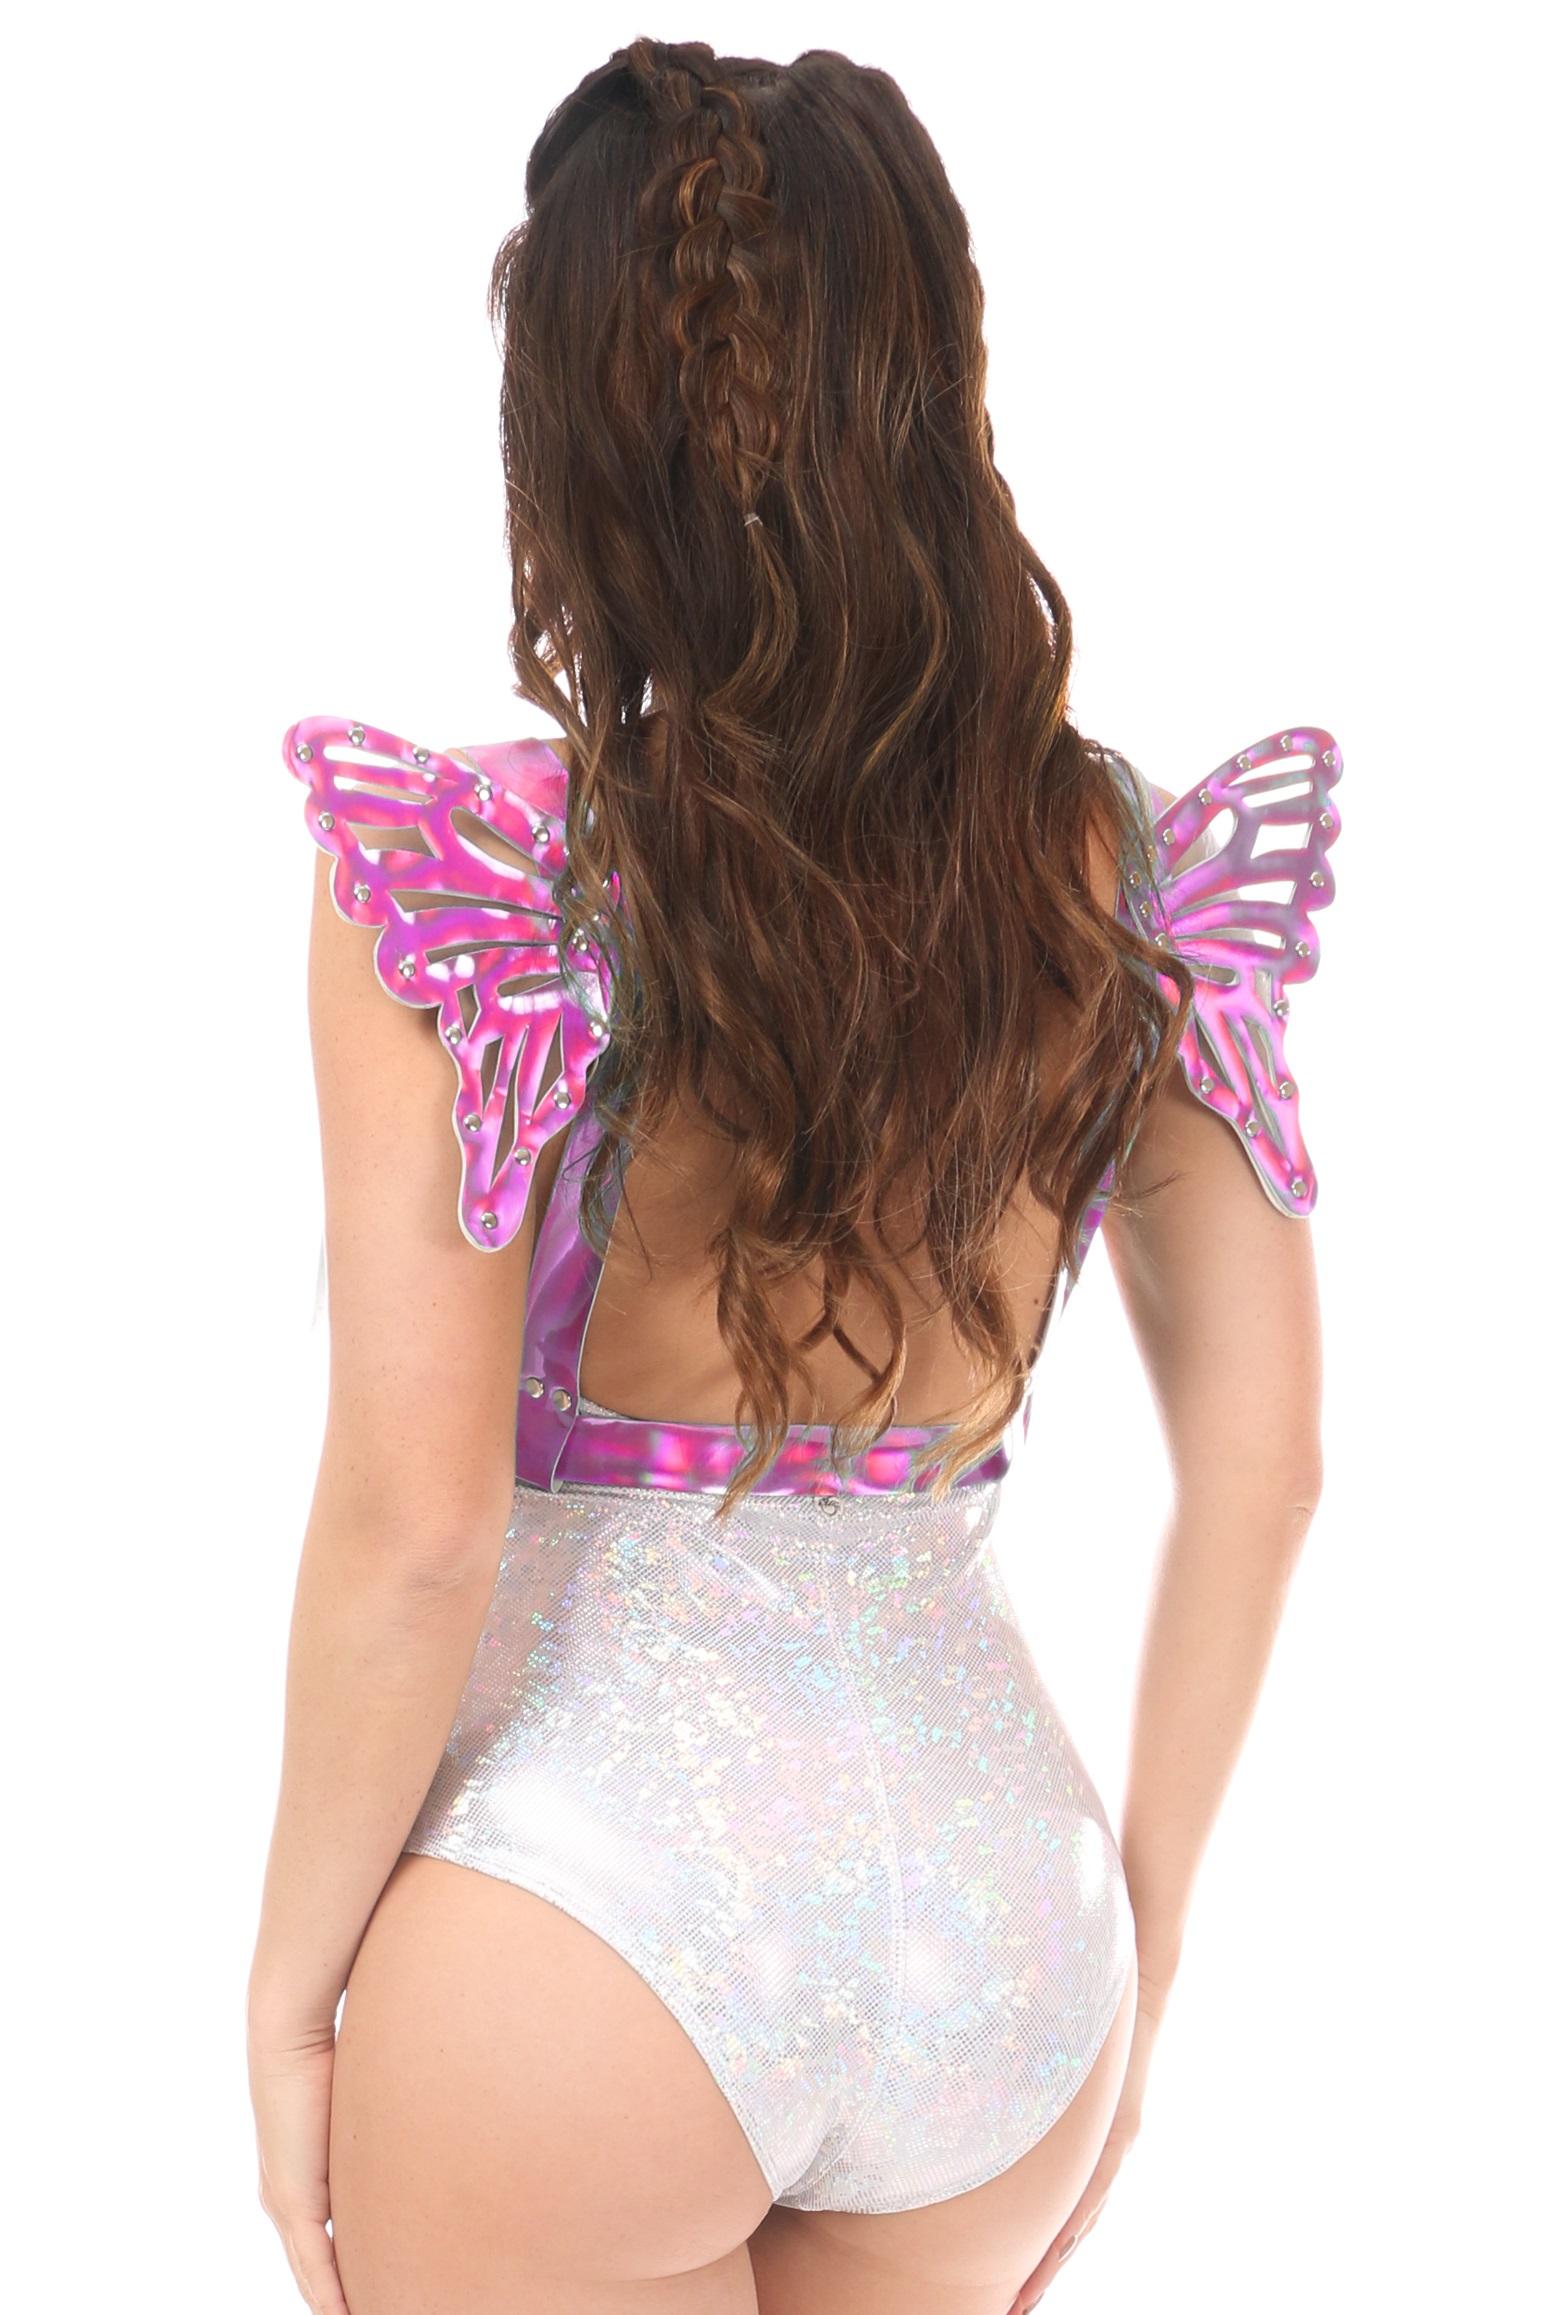 Fuchsia Holo Body Harness w/Wings - Small DASHAR-134